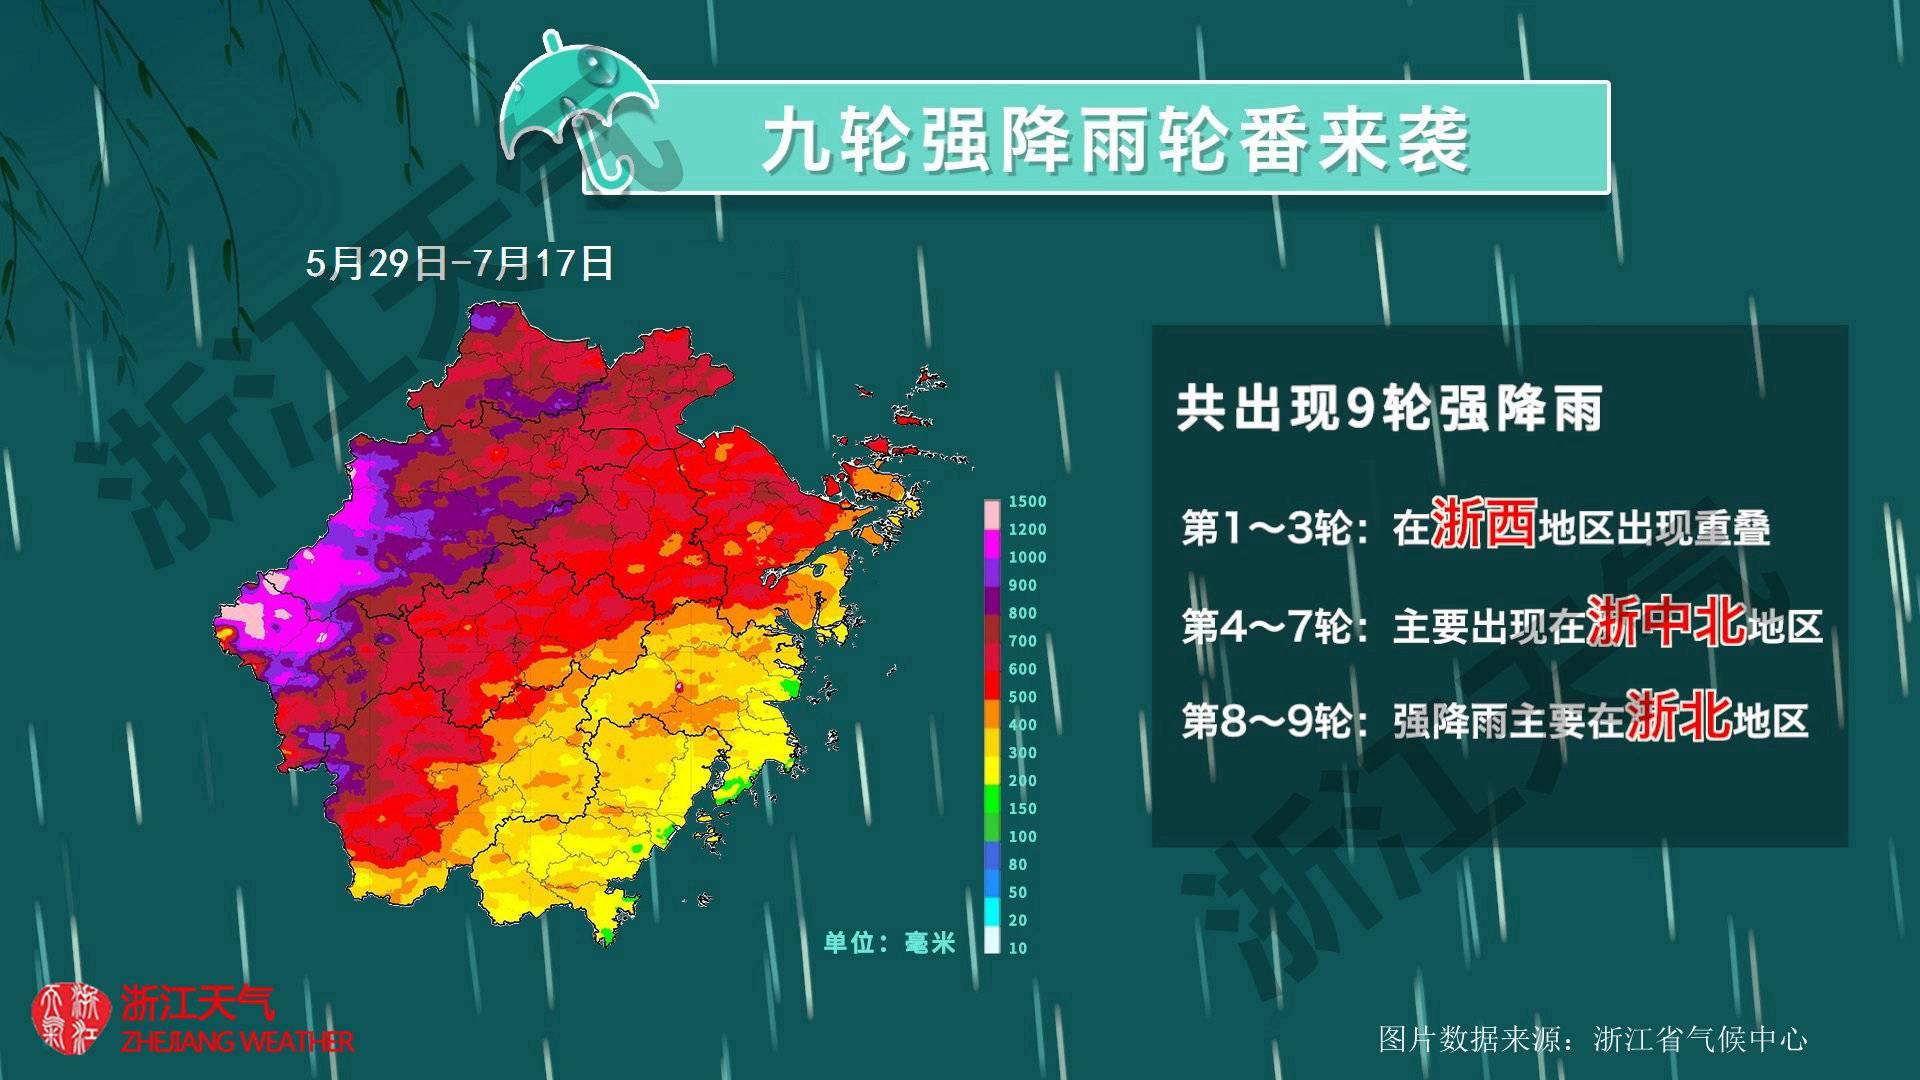 http://i.weather.com.cn/images/zhejiang1/rdzt/2020/07/19/1595150703406062809.jpg